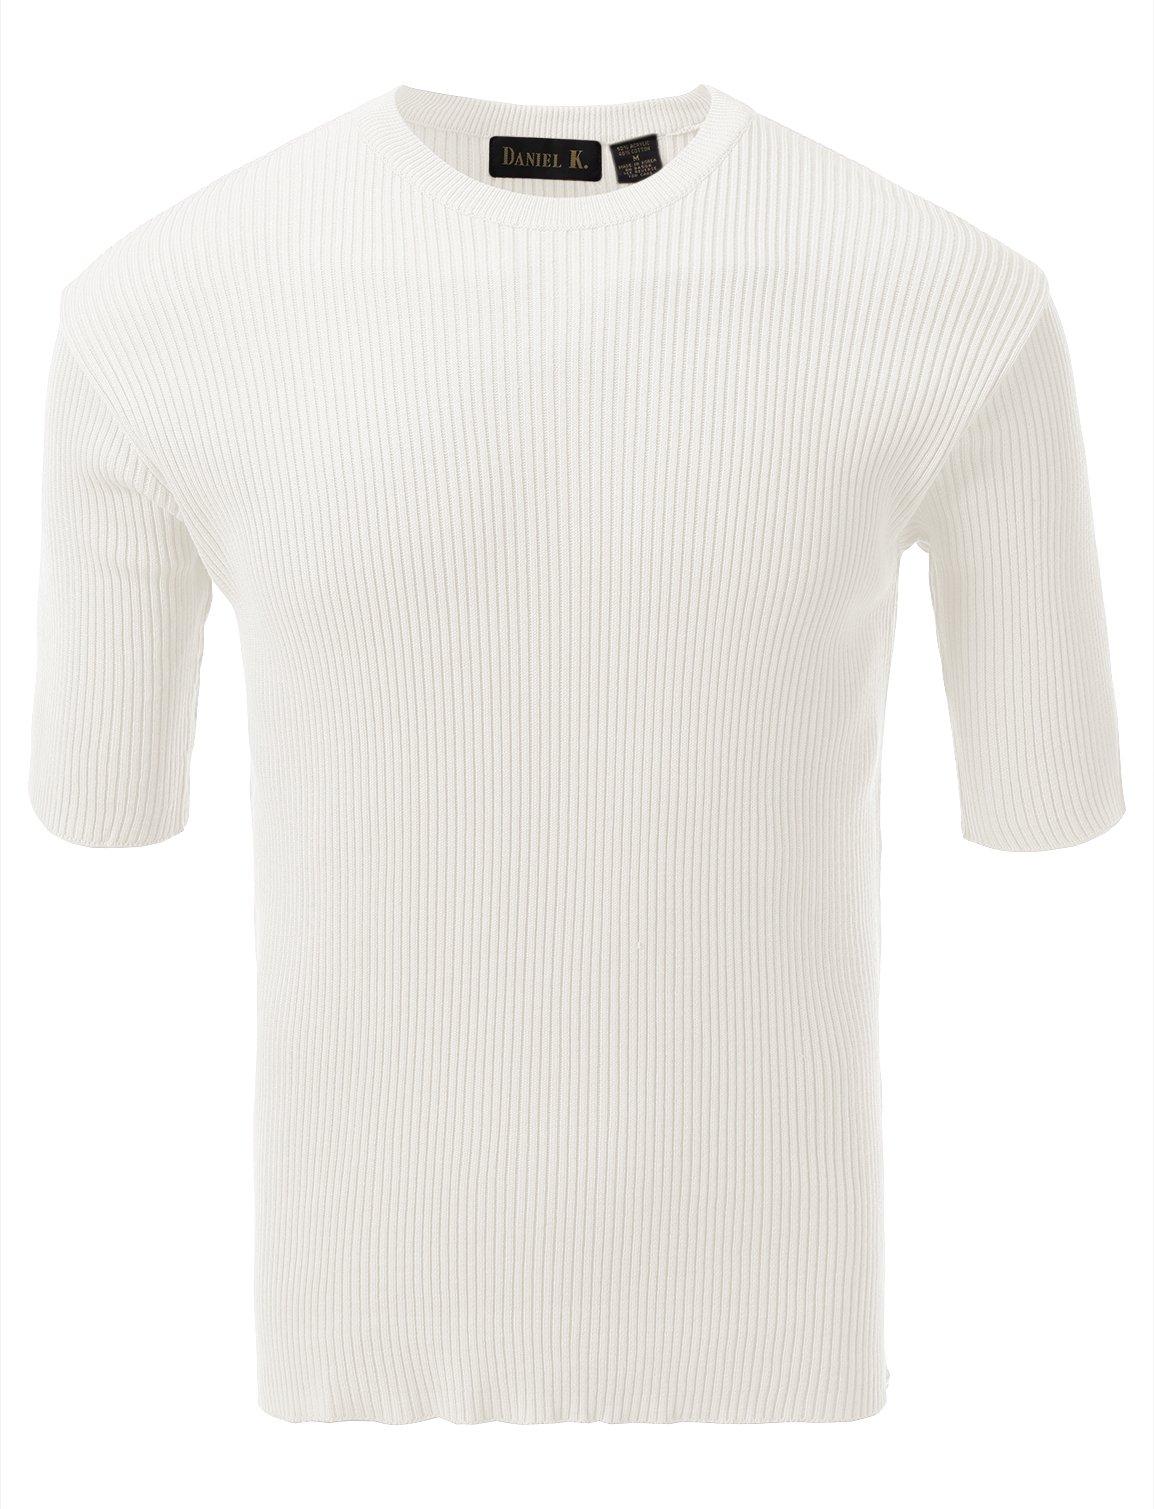 7 Encounter Men's Crewneck Short Sleeve Small Ribbed Sweater Cream S